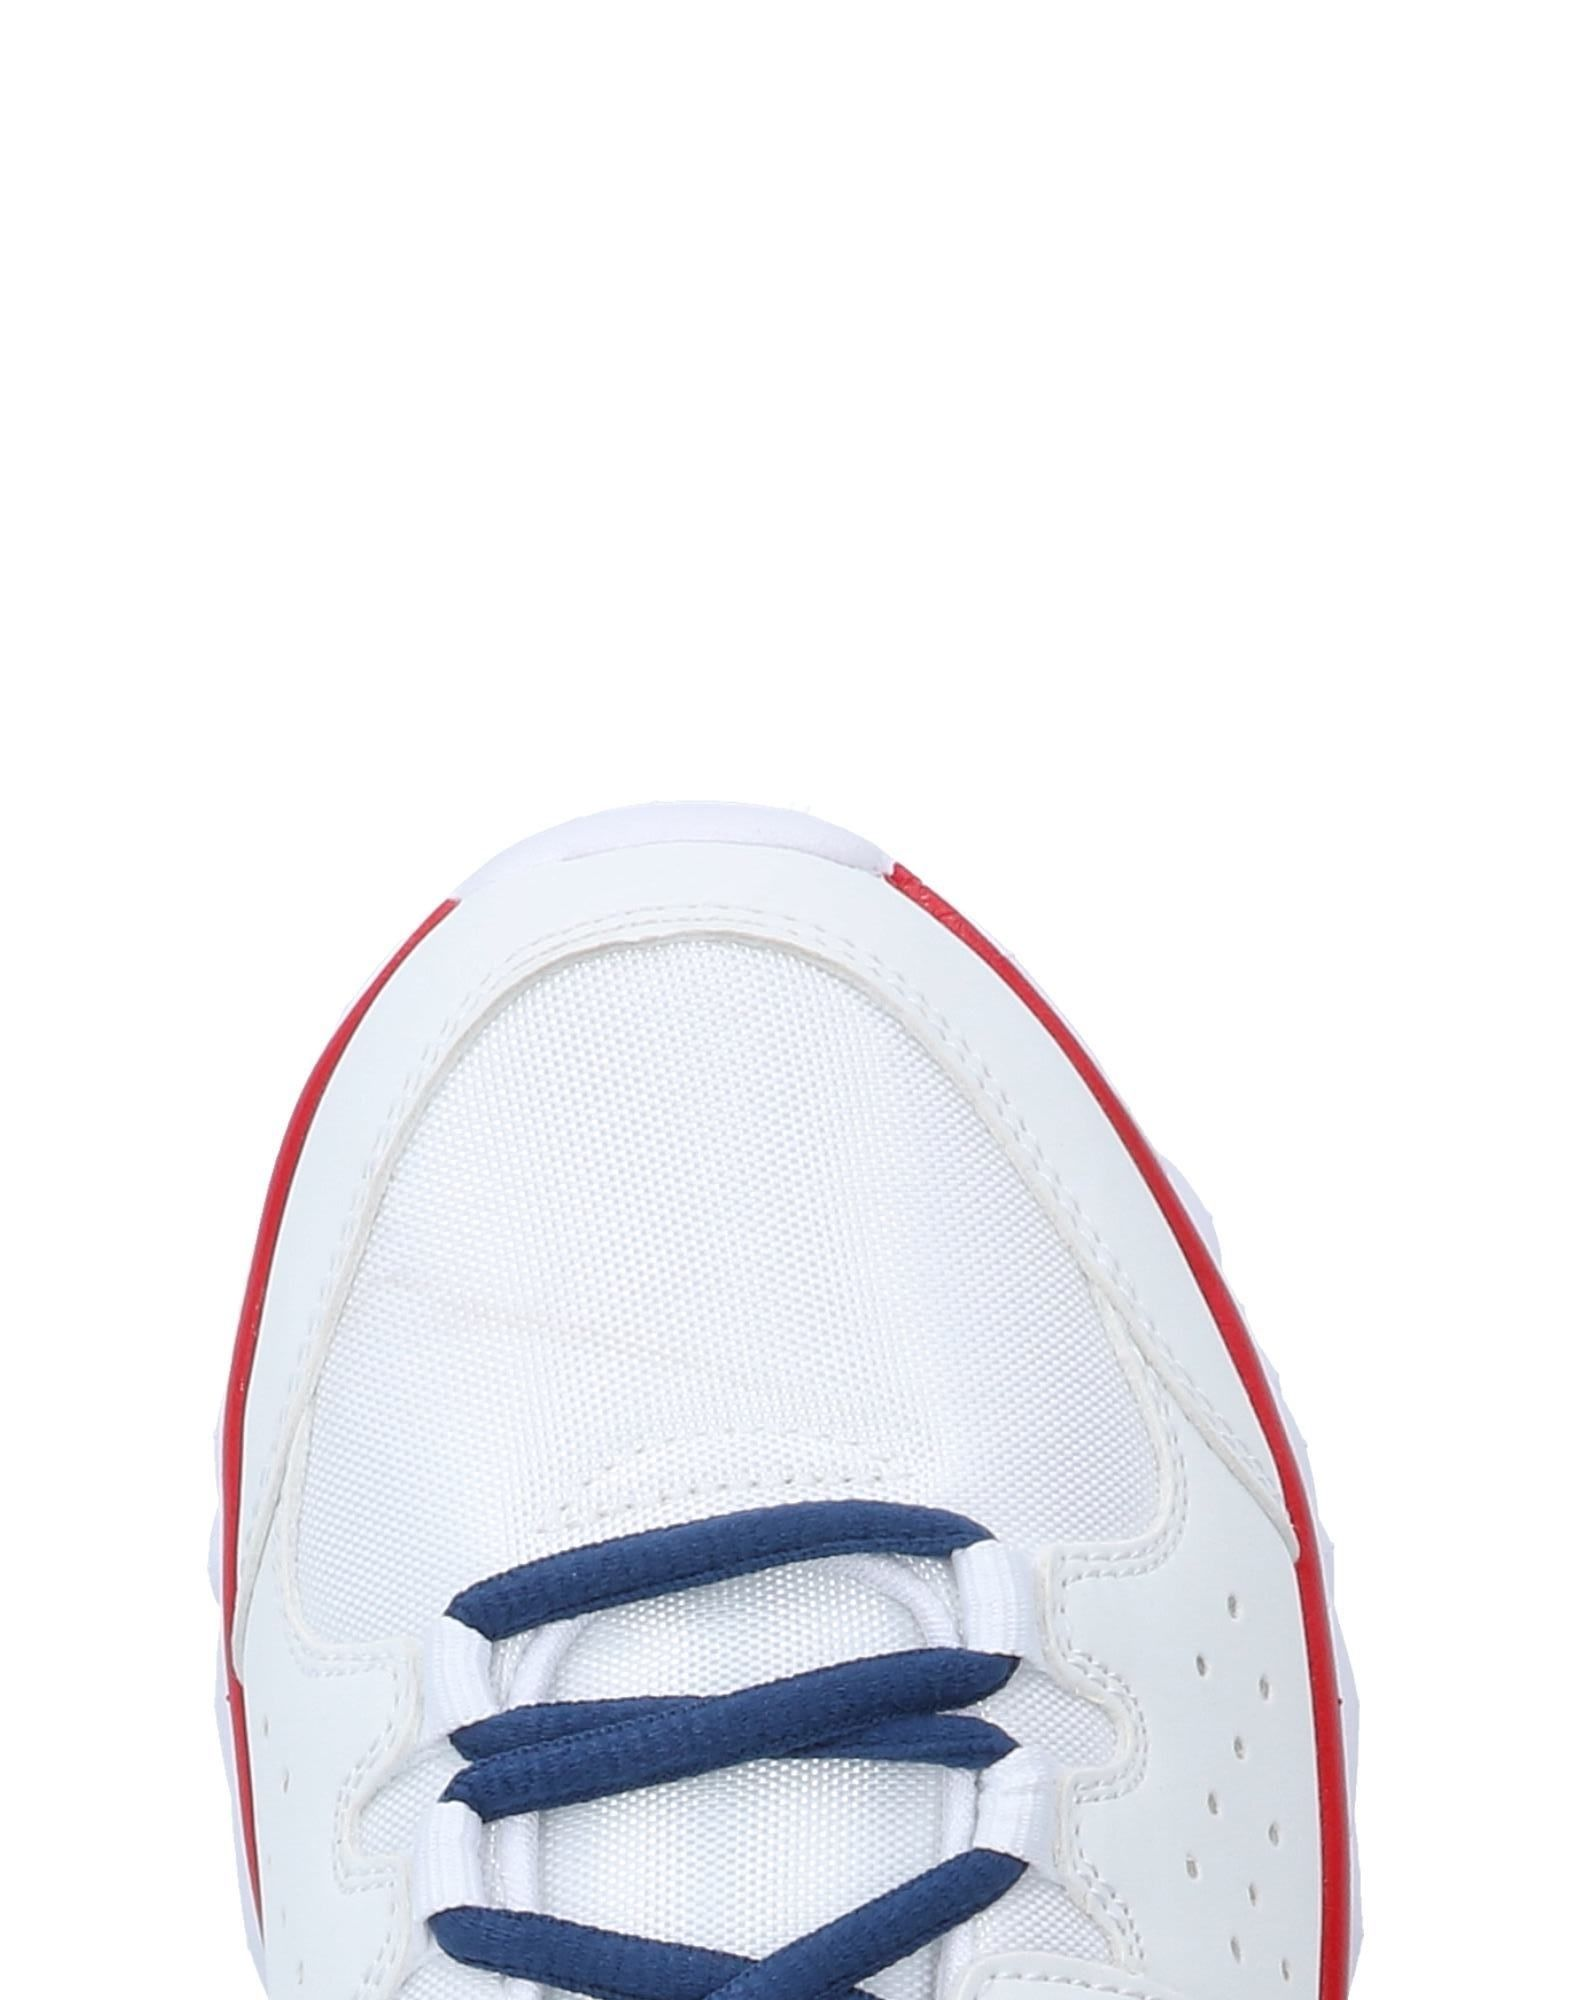 Herren Diadora Sneakers Herren   11483779KV Heiße Schuhe 431803